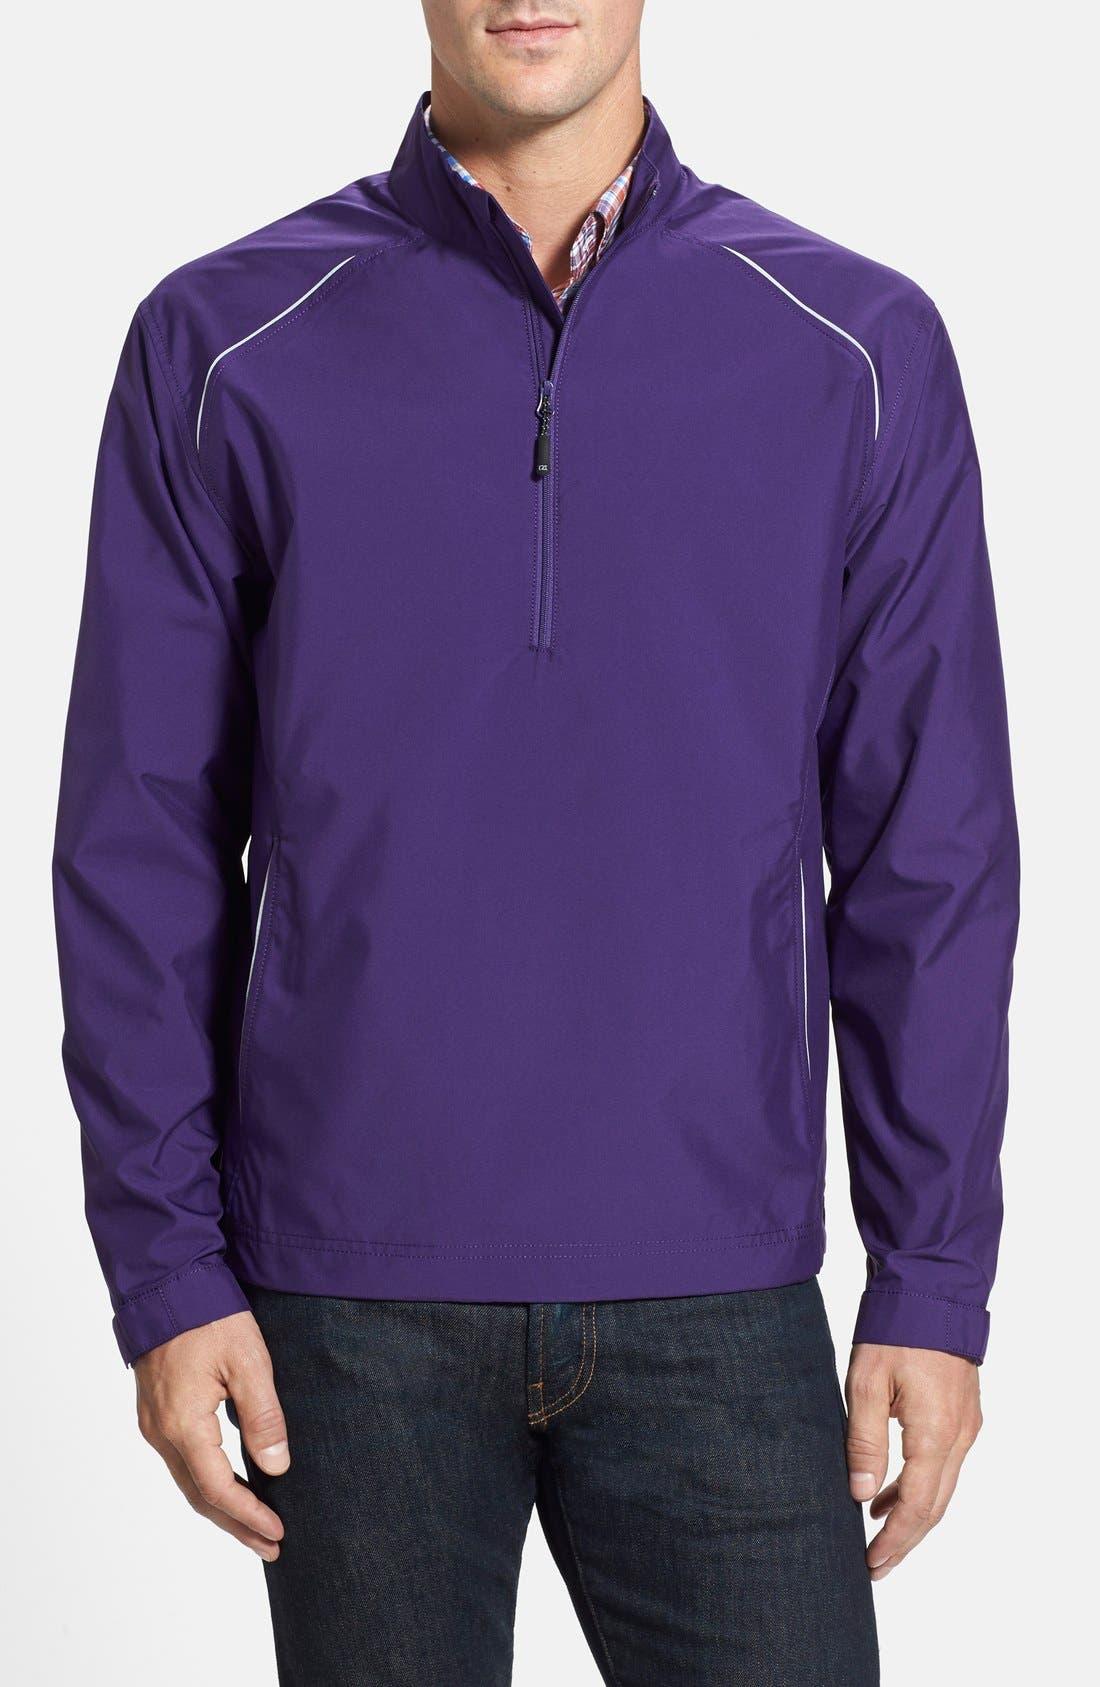 Main Image - Cutter & Buck 'Beacon' WeatherTec Wind & Water Resistant Jacket